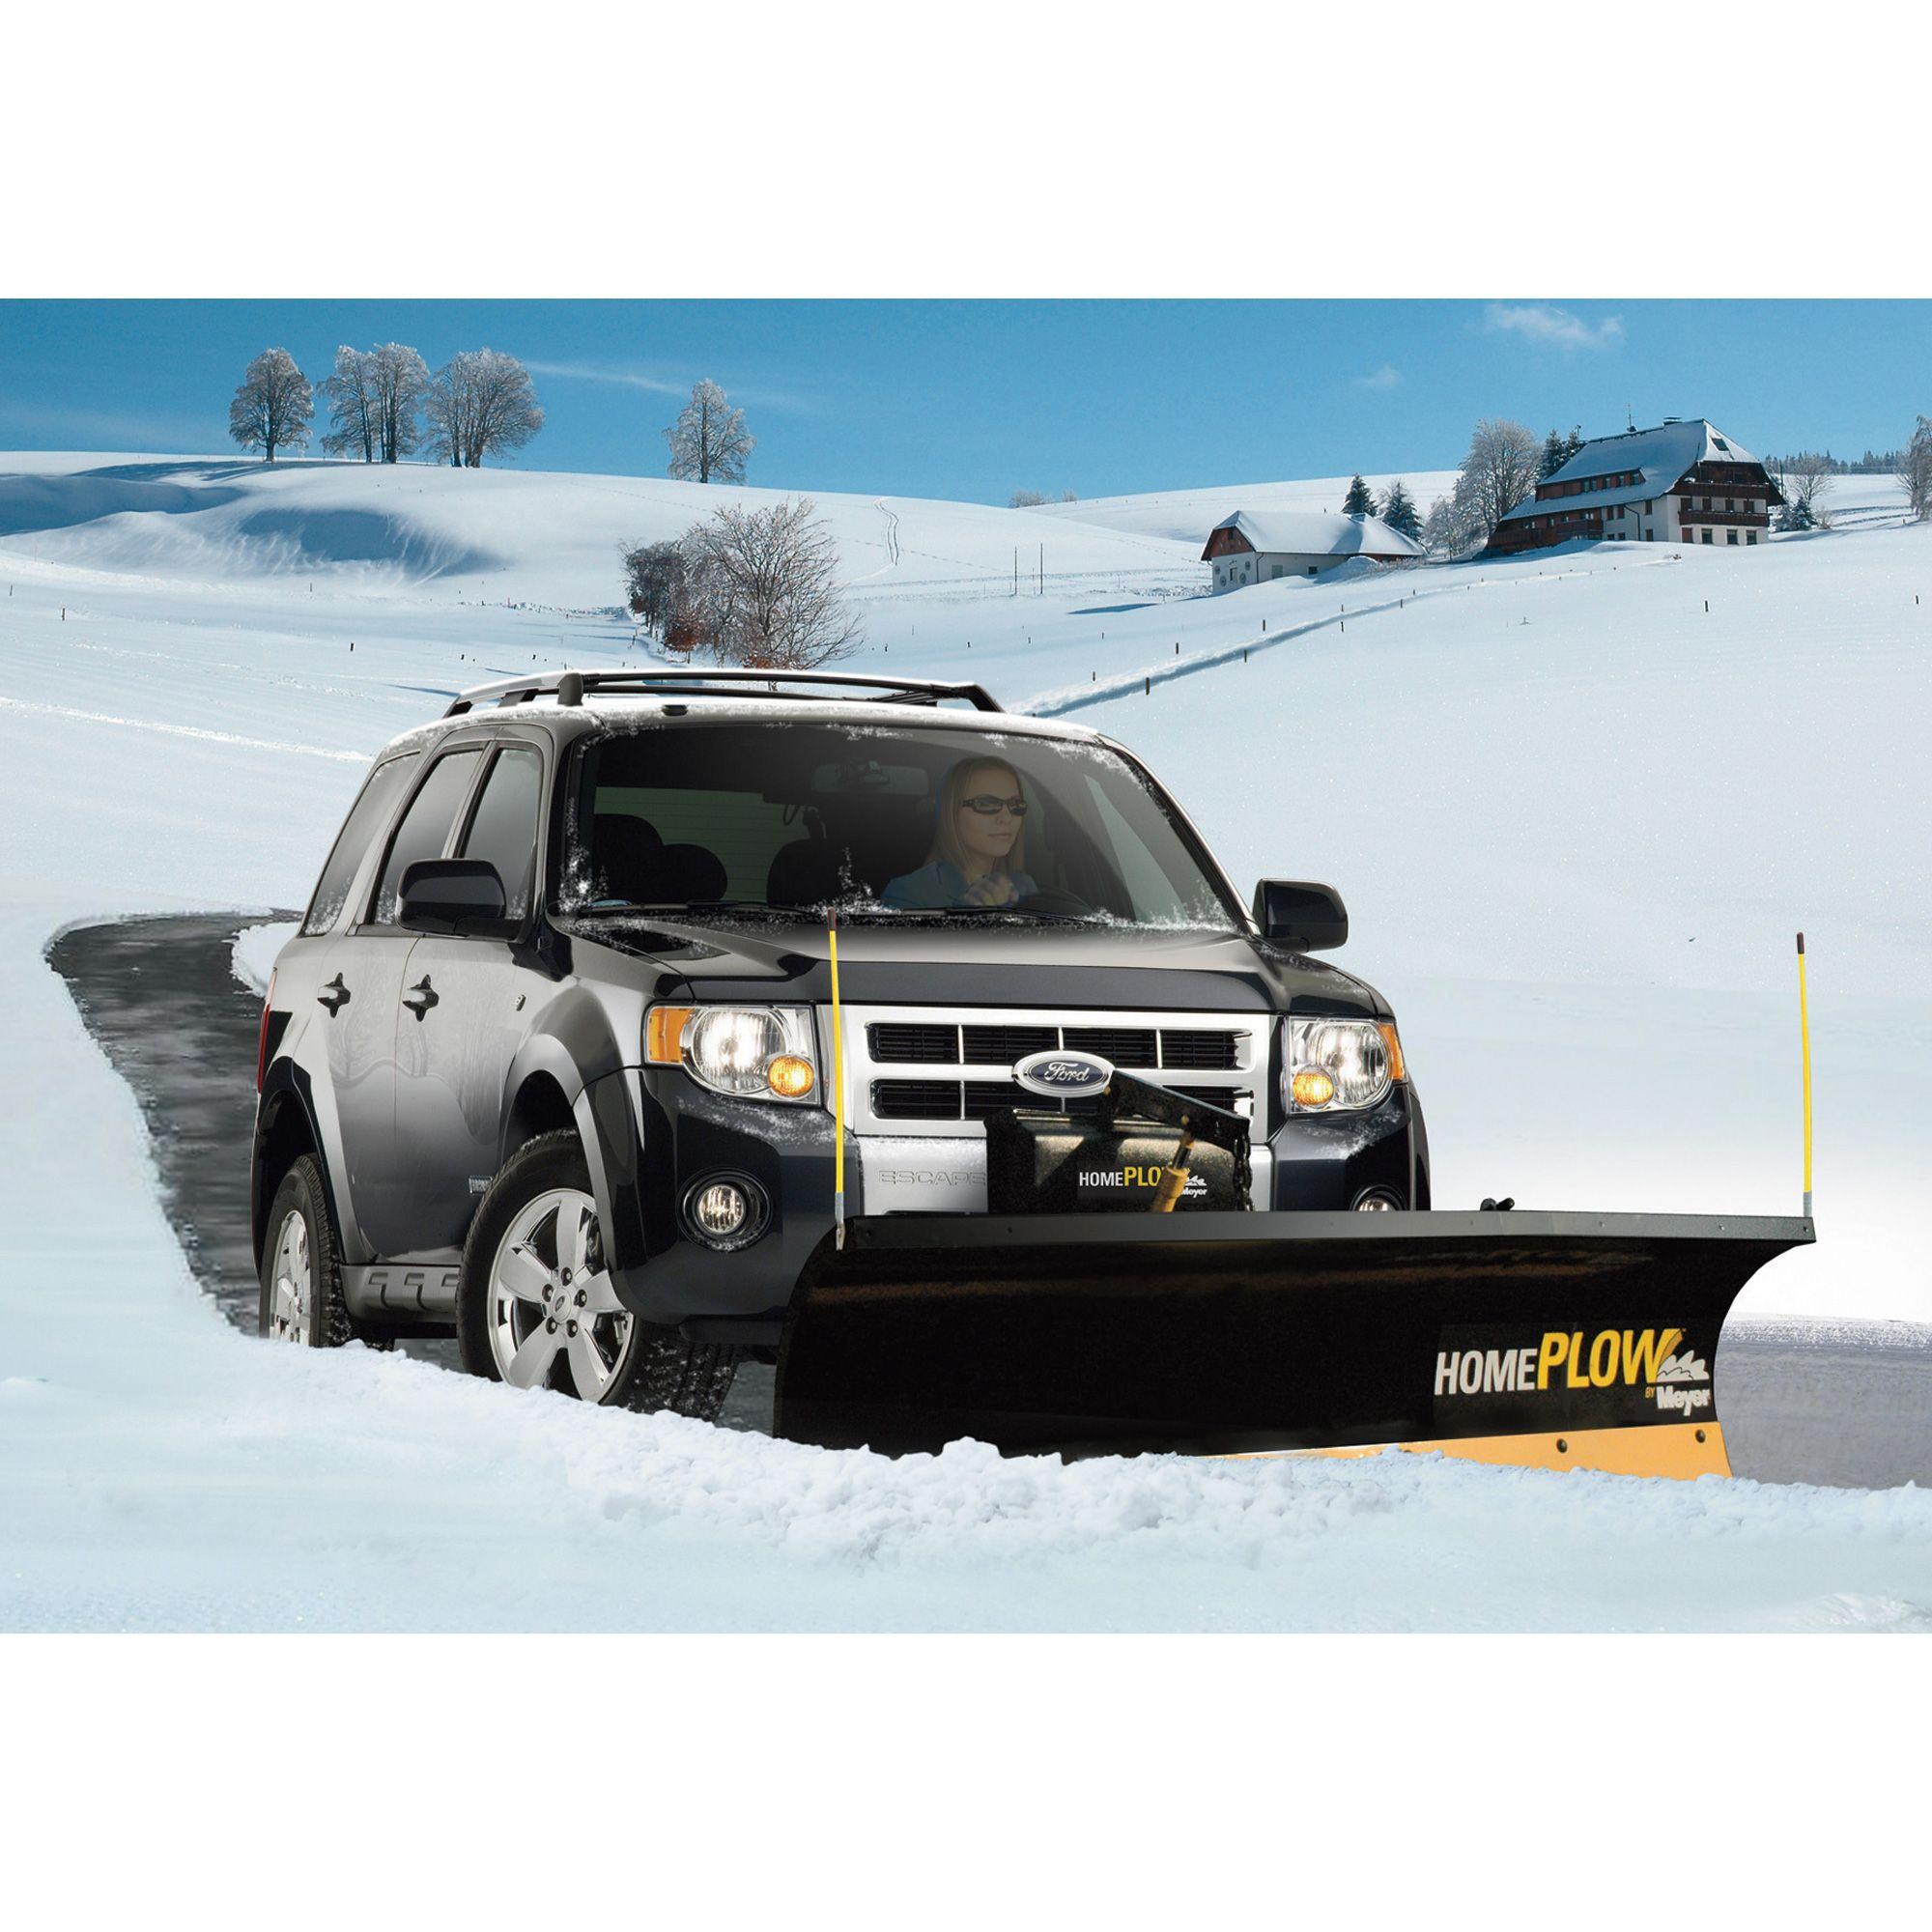 Home Plow By Meyer Snowplow Auto Angling 80in Model 25000 Snow Plow Snow Plow Truck Pickup Trucks